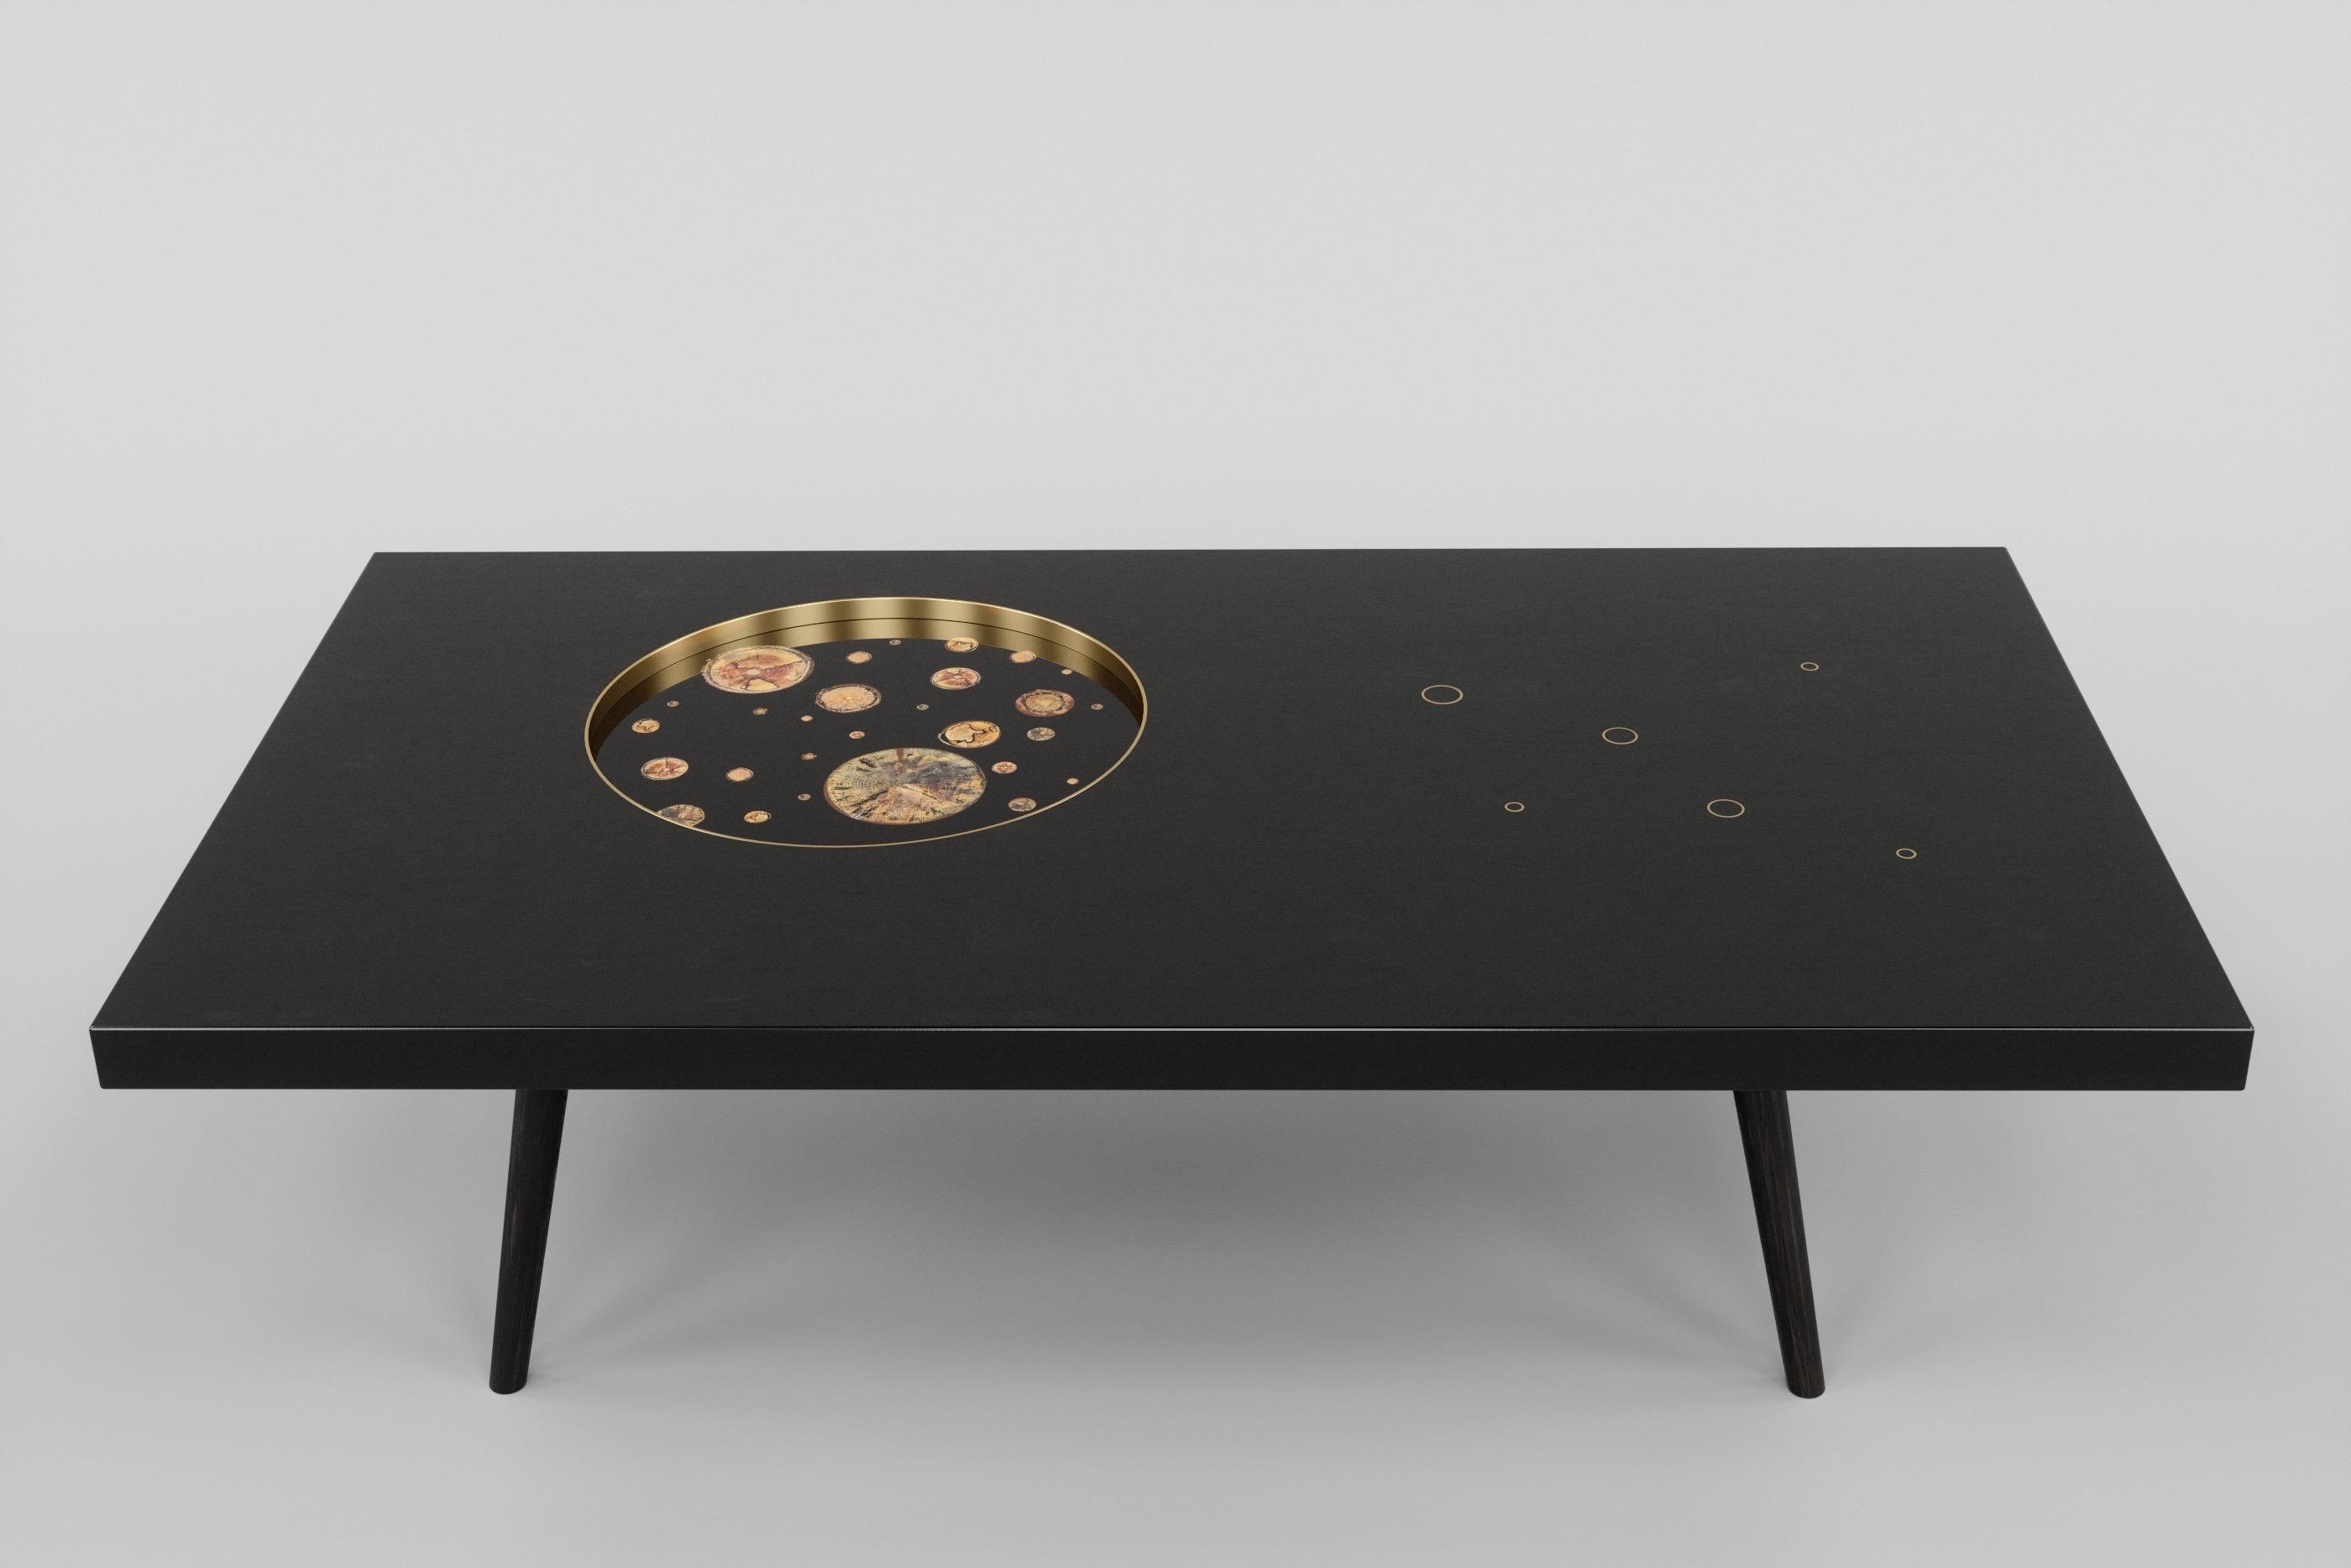 Perception Coffee Table